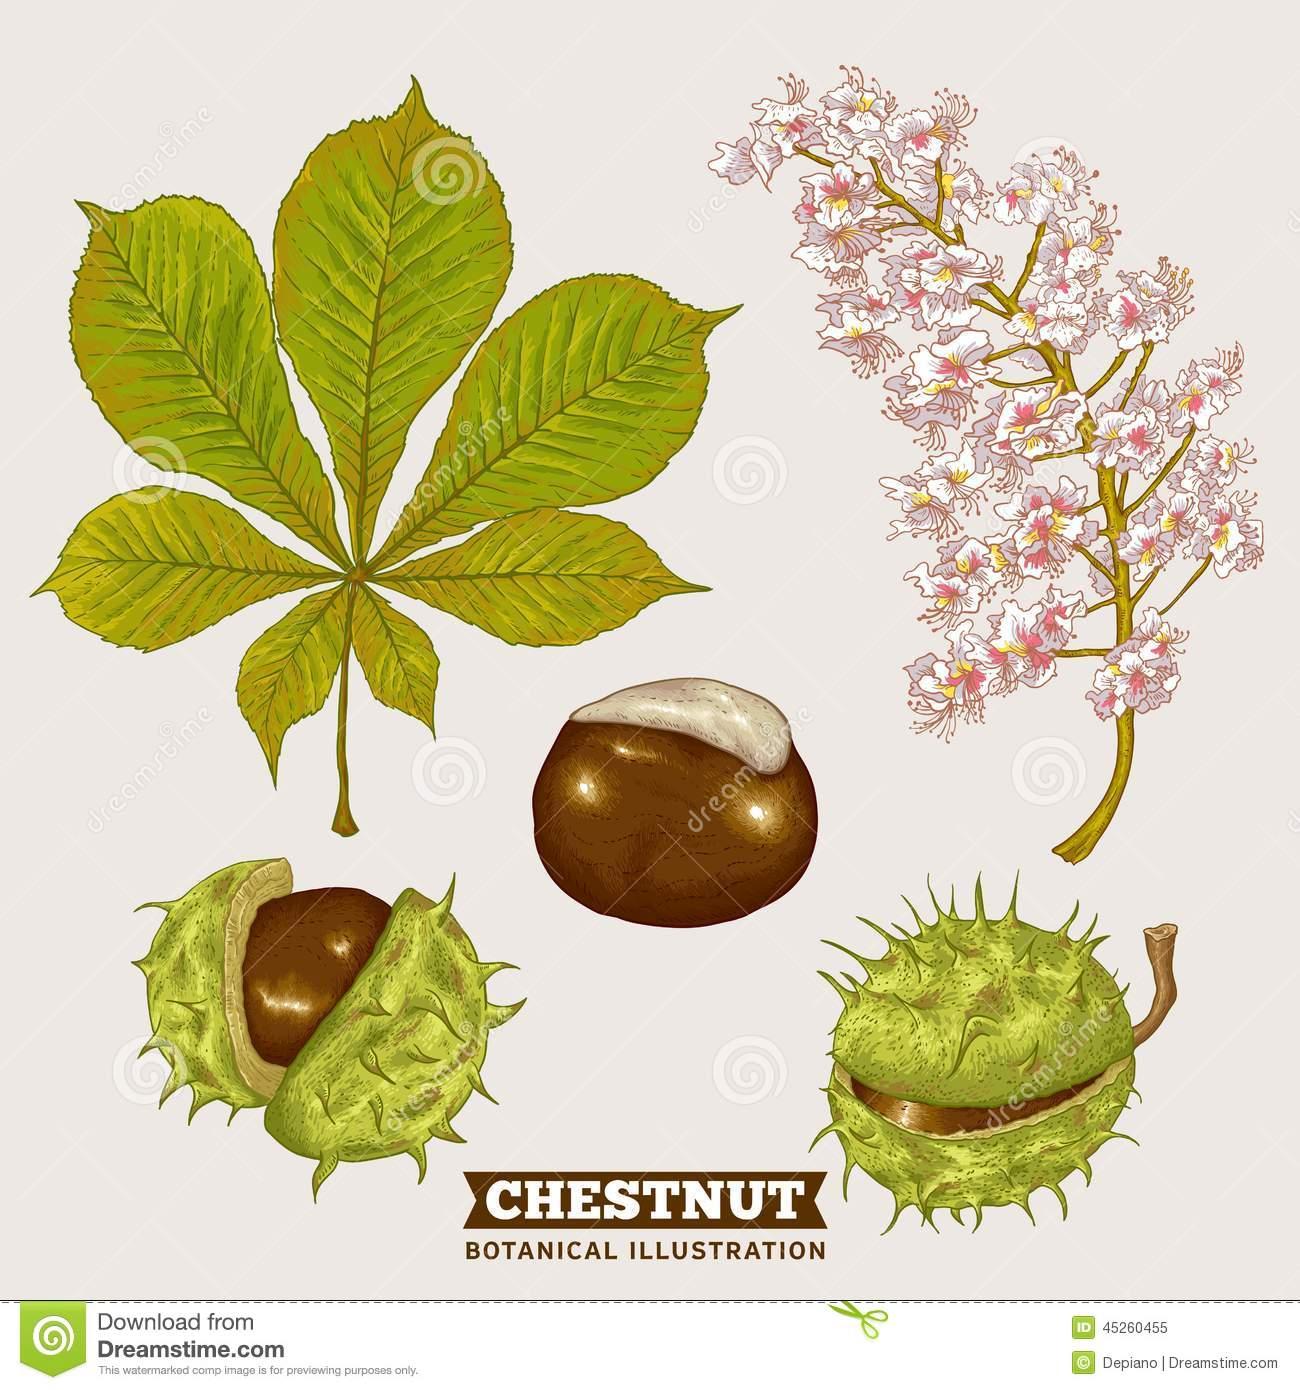 Blossom Chestnut Botanical Vector Illustration Stock Vector.